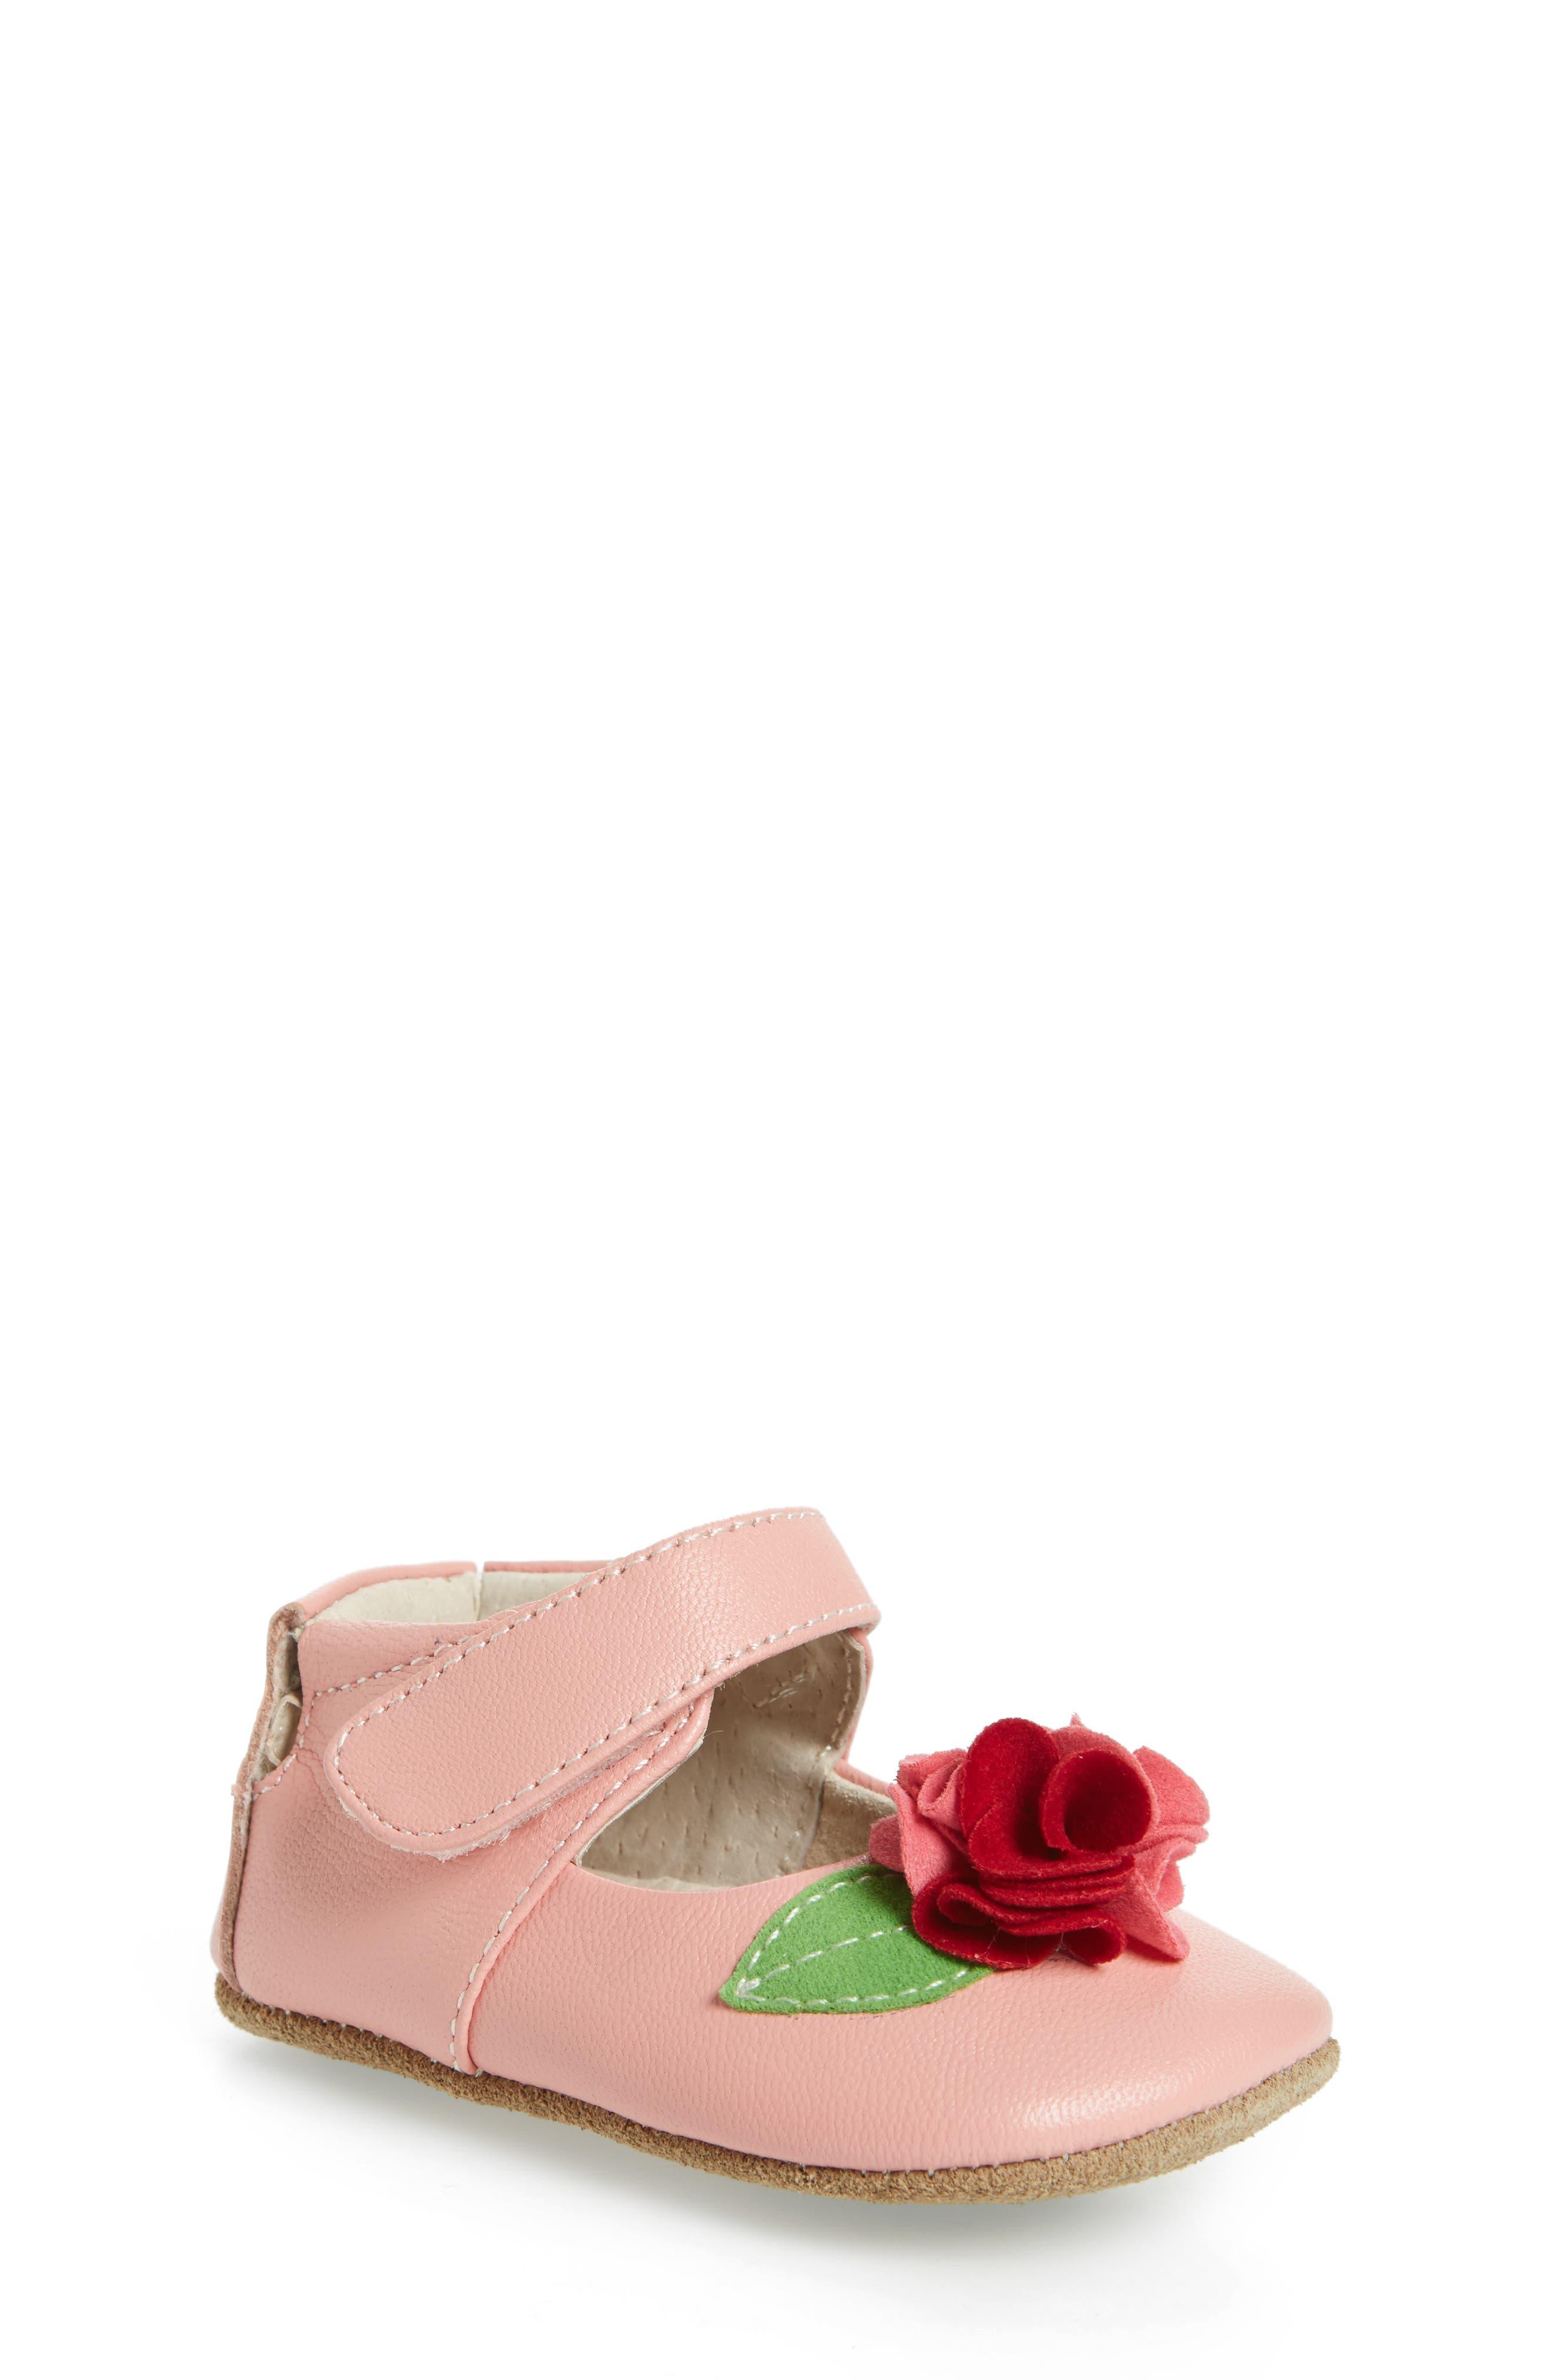 Rosa Mary Jane Crib Shoe,                             Main thumbnail 1, color,                             Light Pink